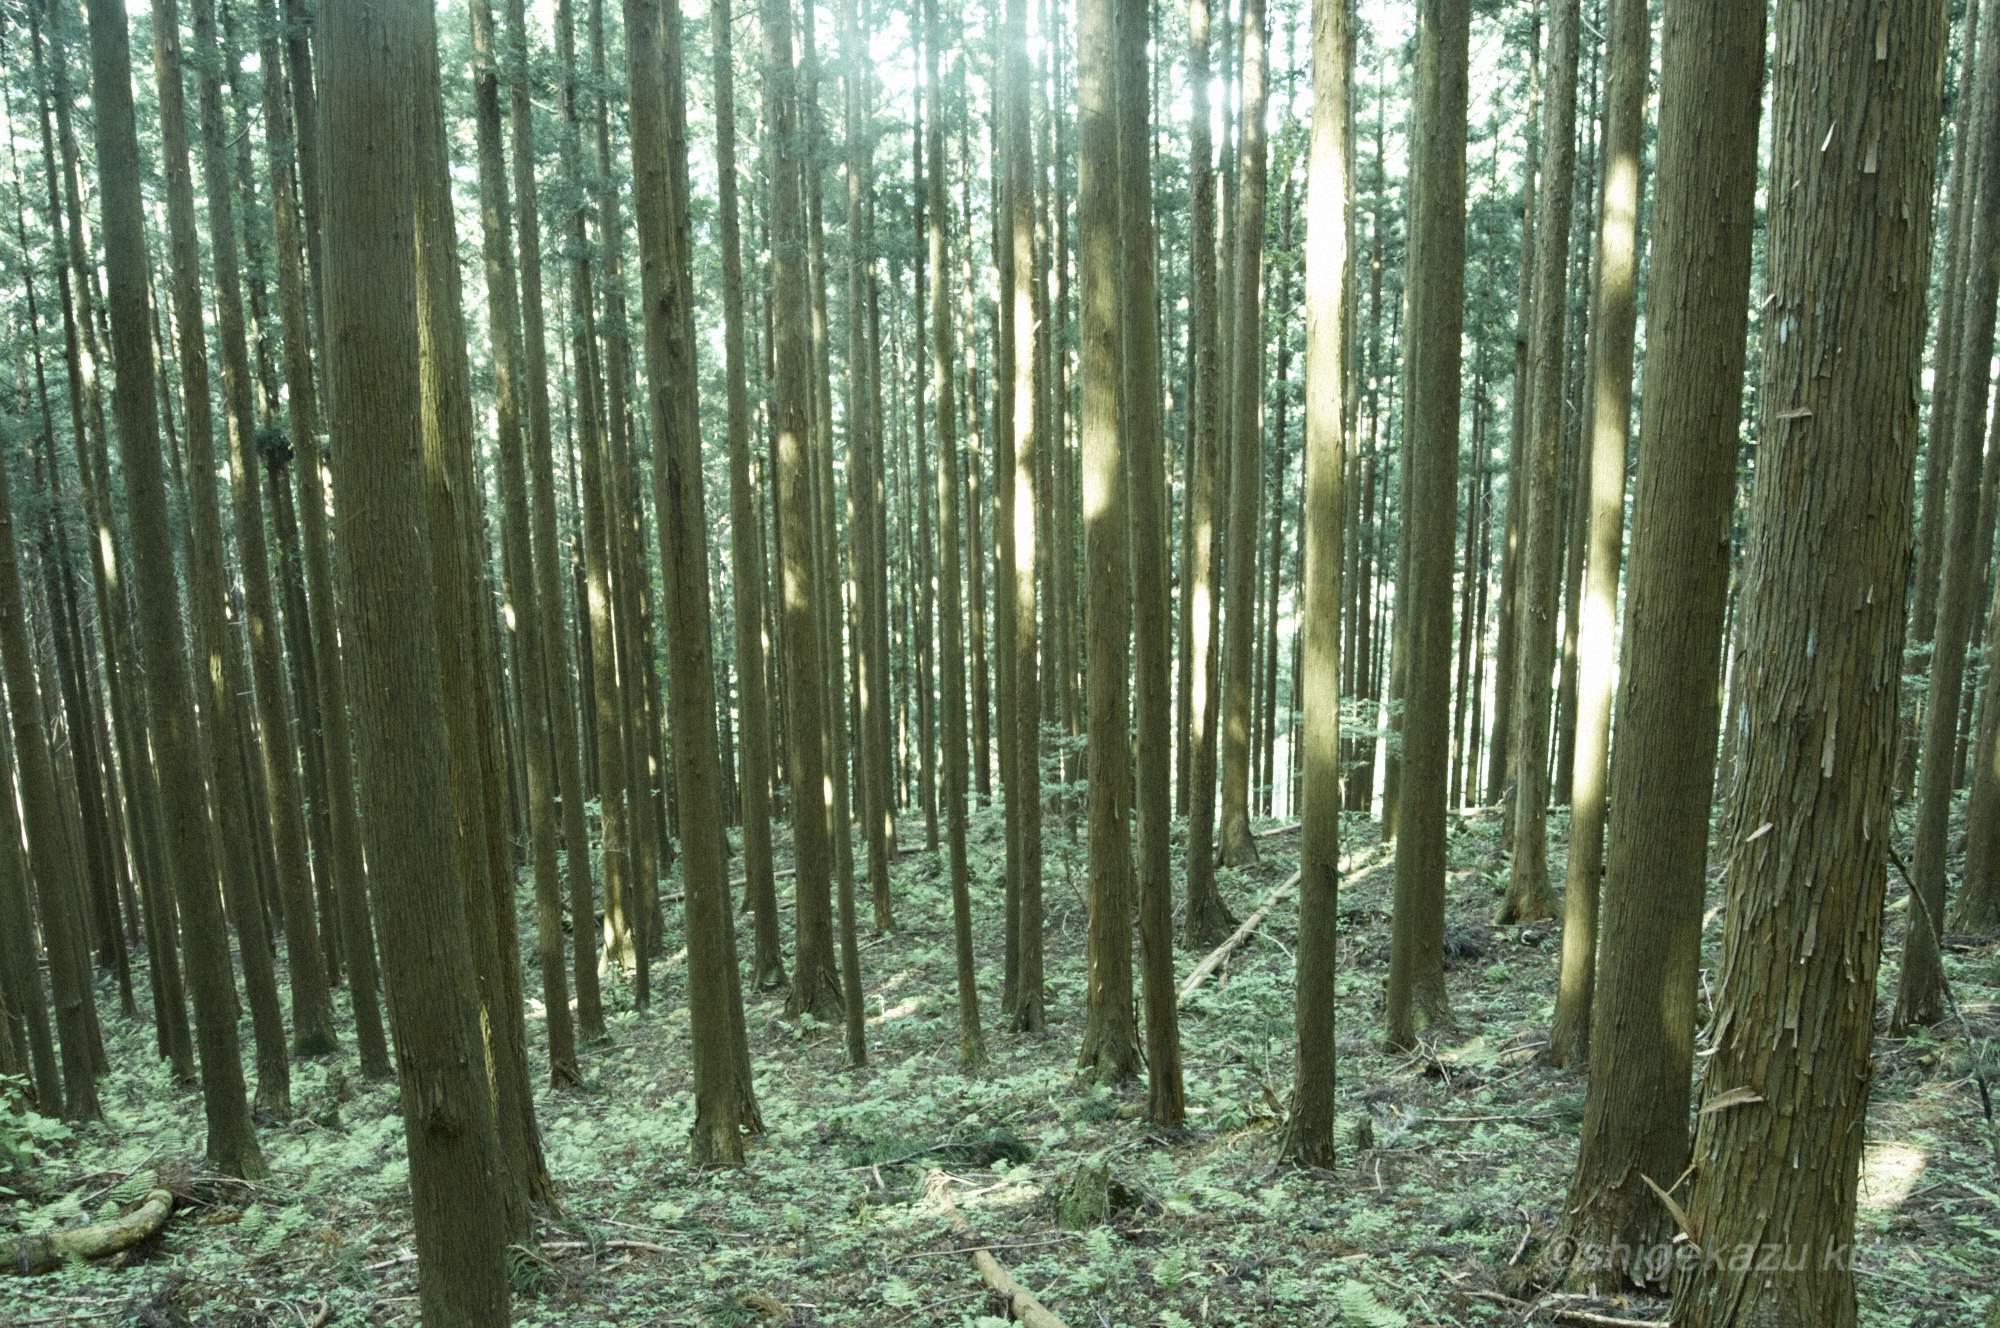 貴田茂和 shigekazu kida 熊野古道の山上ヶ岳